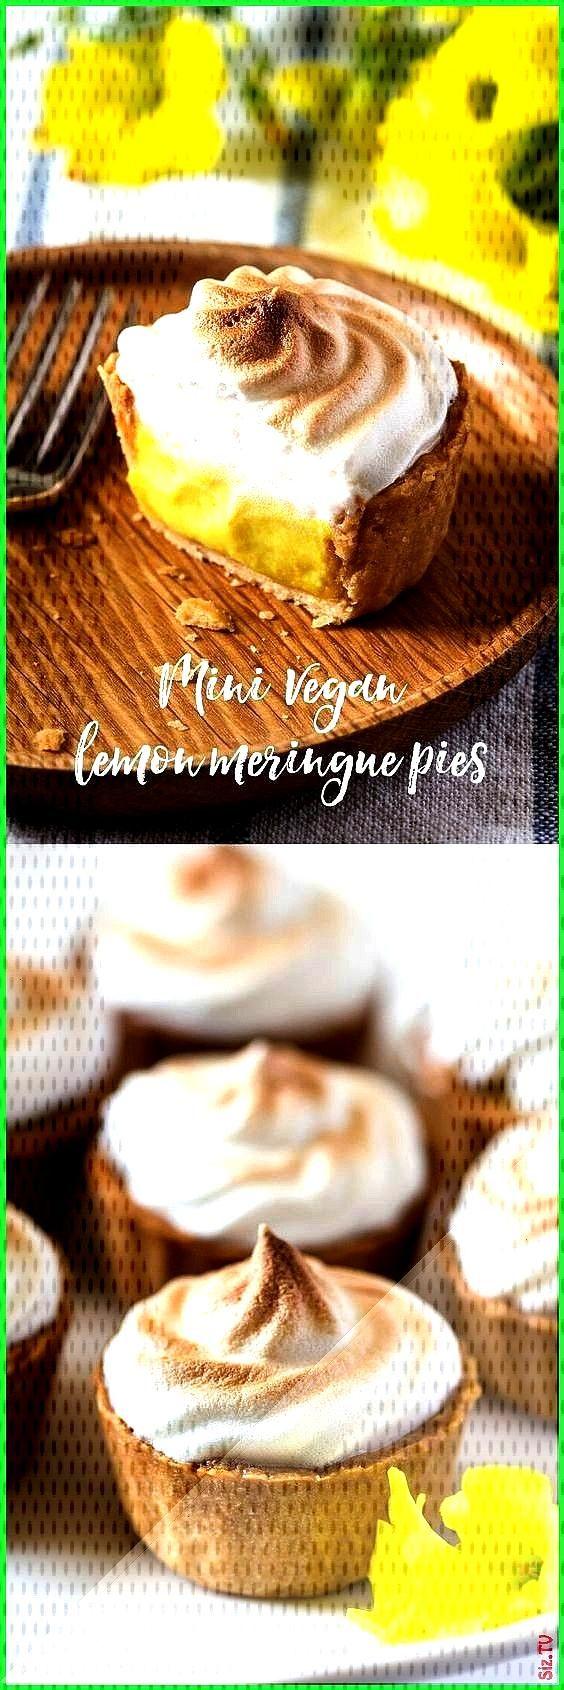 vegan lemon meringue pies lemonmeringuepie mini vegan lemon meringue pies lemonmeringuecupcakes min